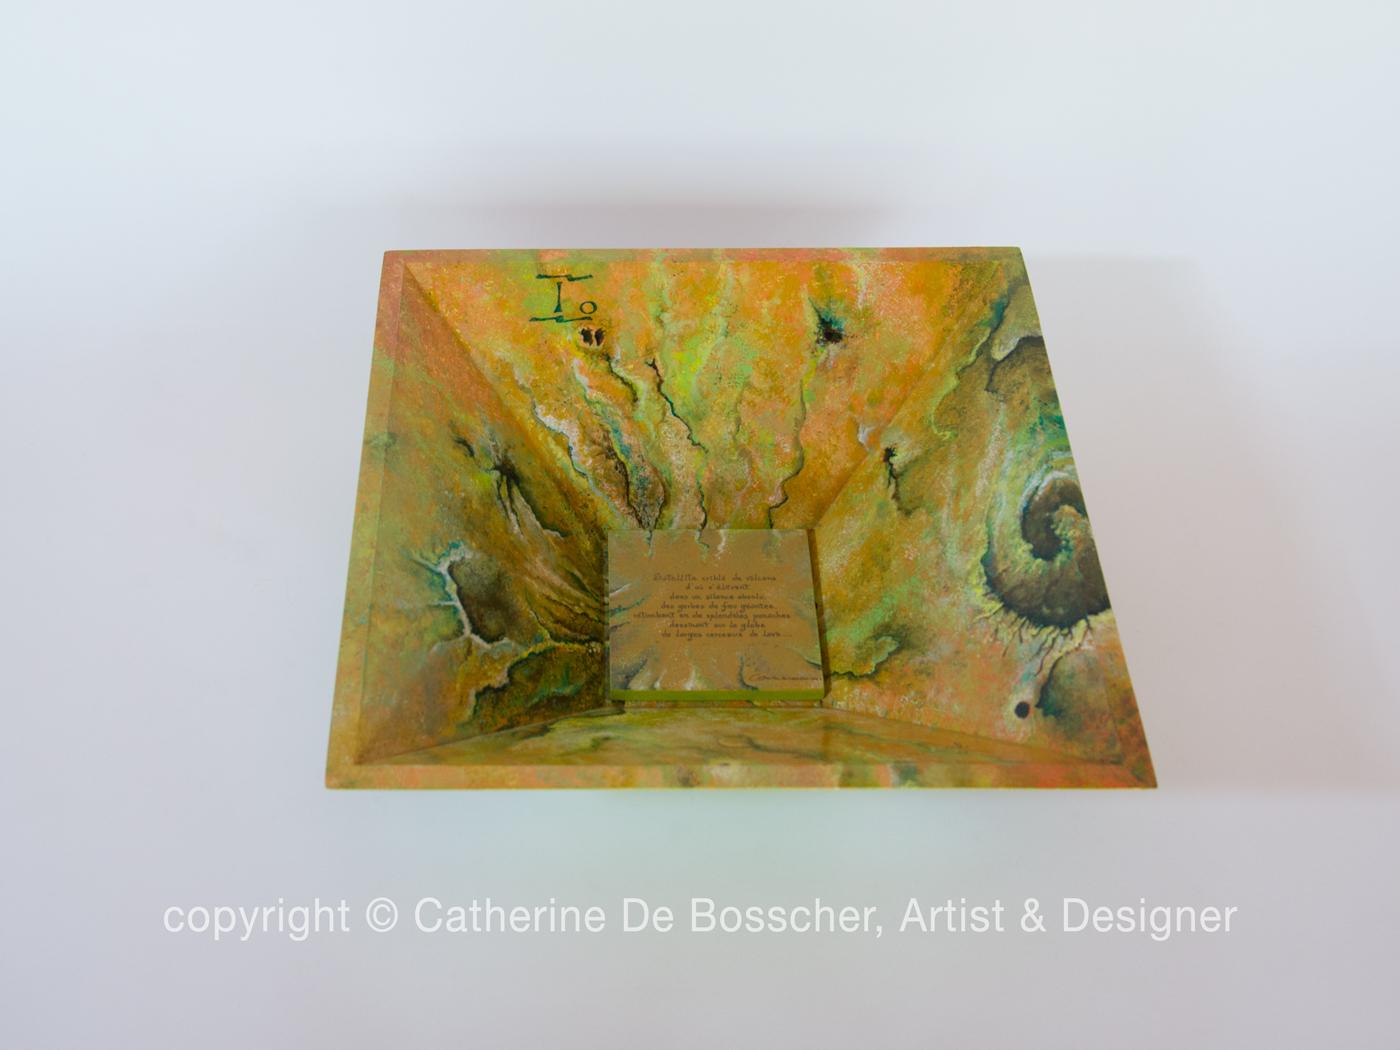 """Satellite IO"" Pyramidal Bowl by Catherine De Bosscher"